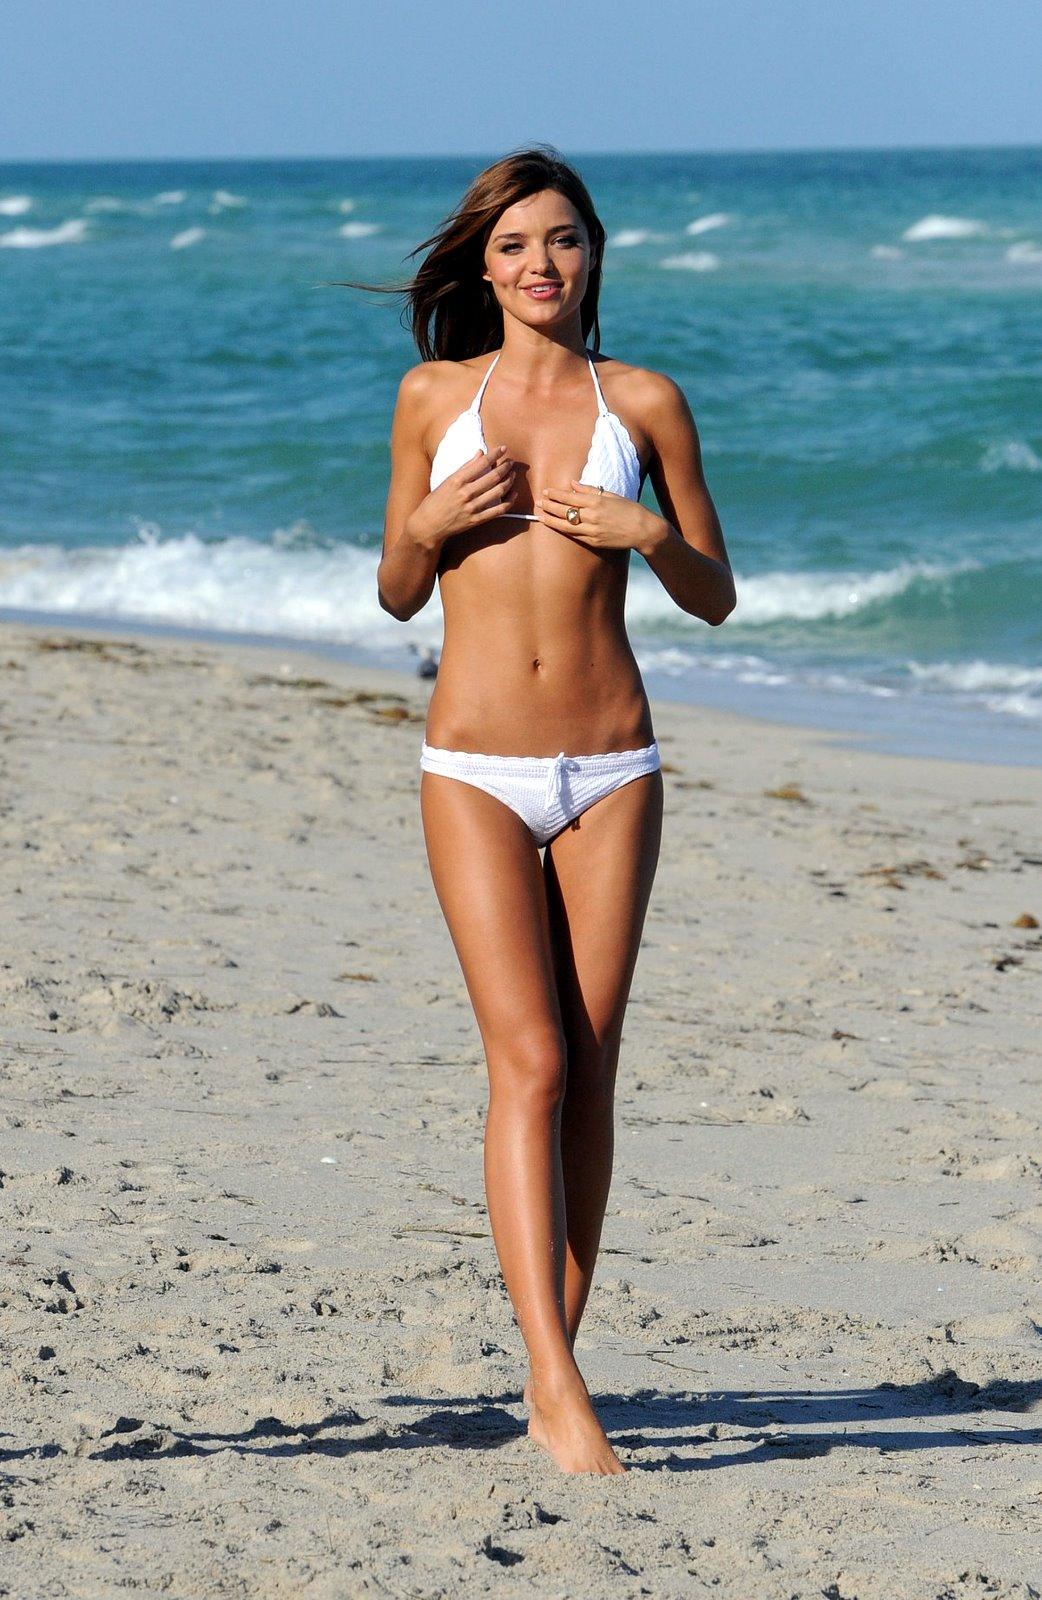 20 звезд попавшихся топлес на пляже 20 фото  Триникси